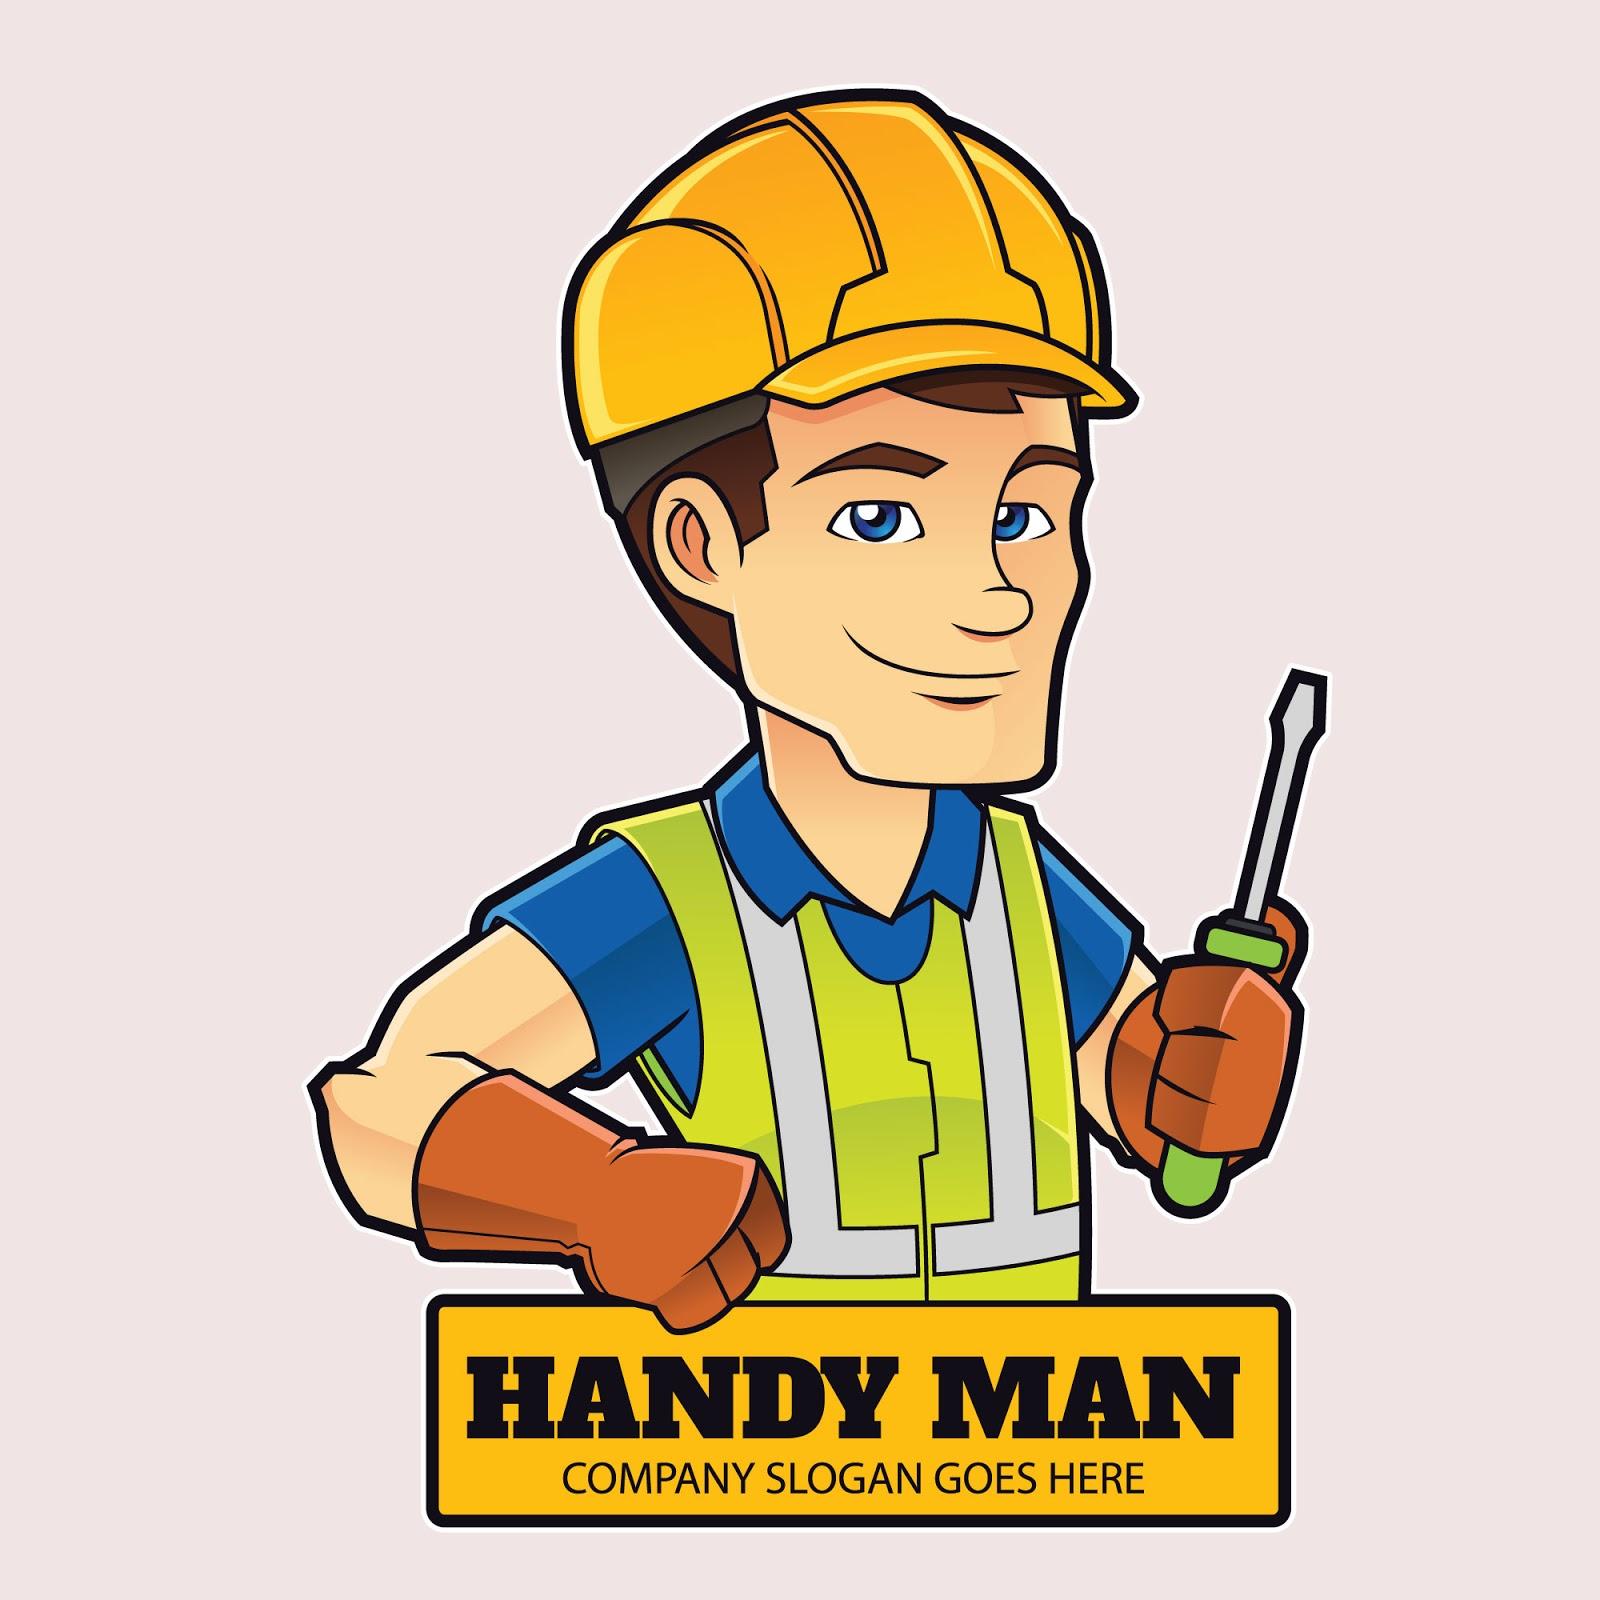 Handyman Mascot Logo Free Download Vector CDR, AI, EPS and PNG Formats